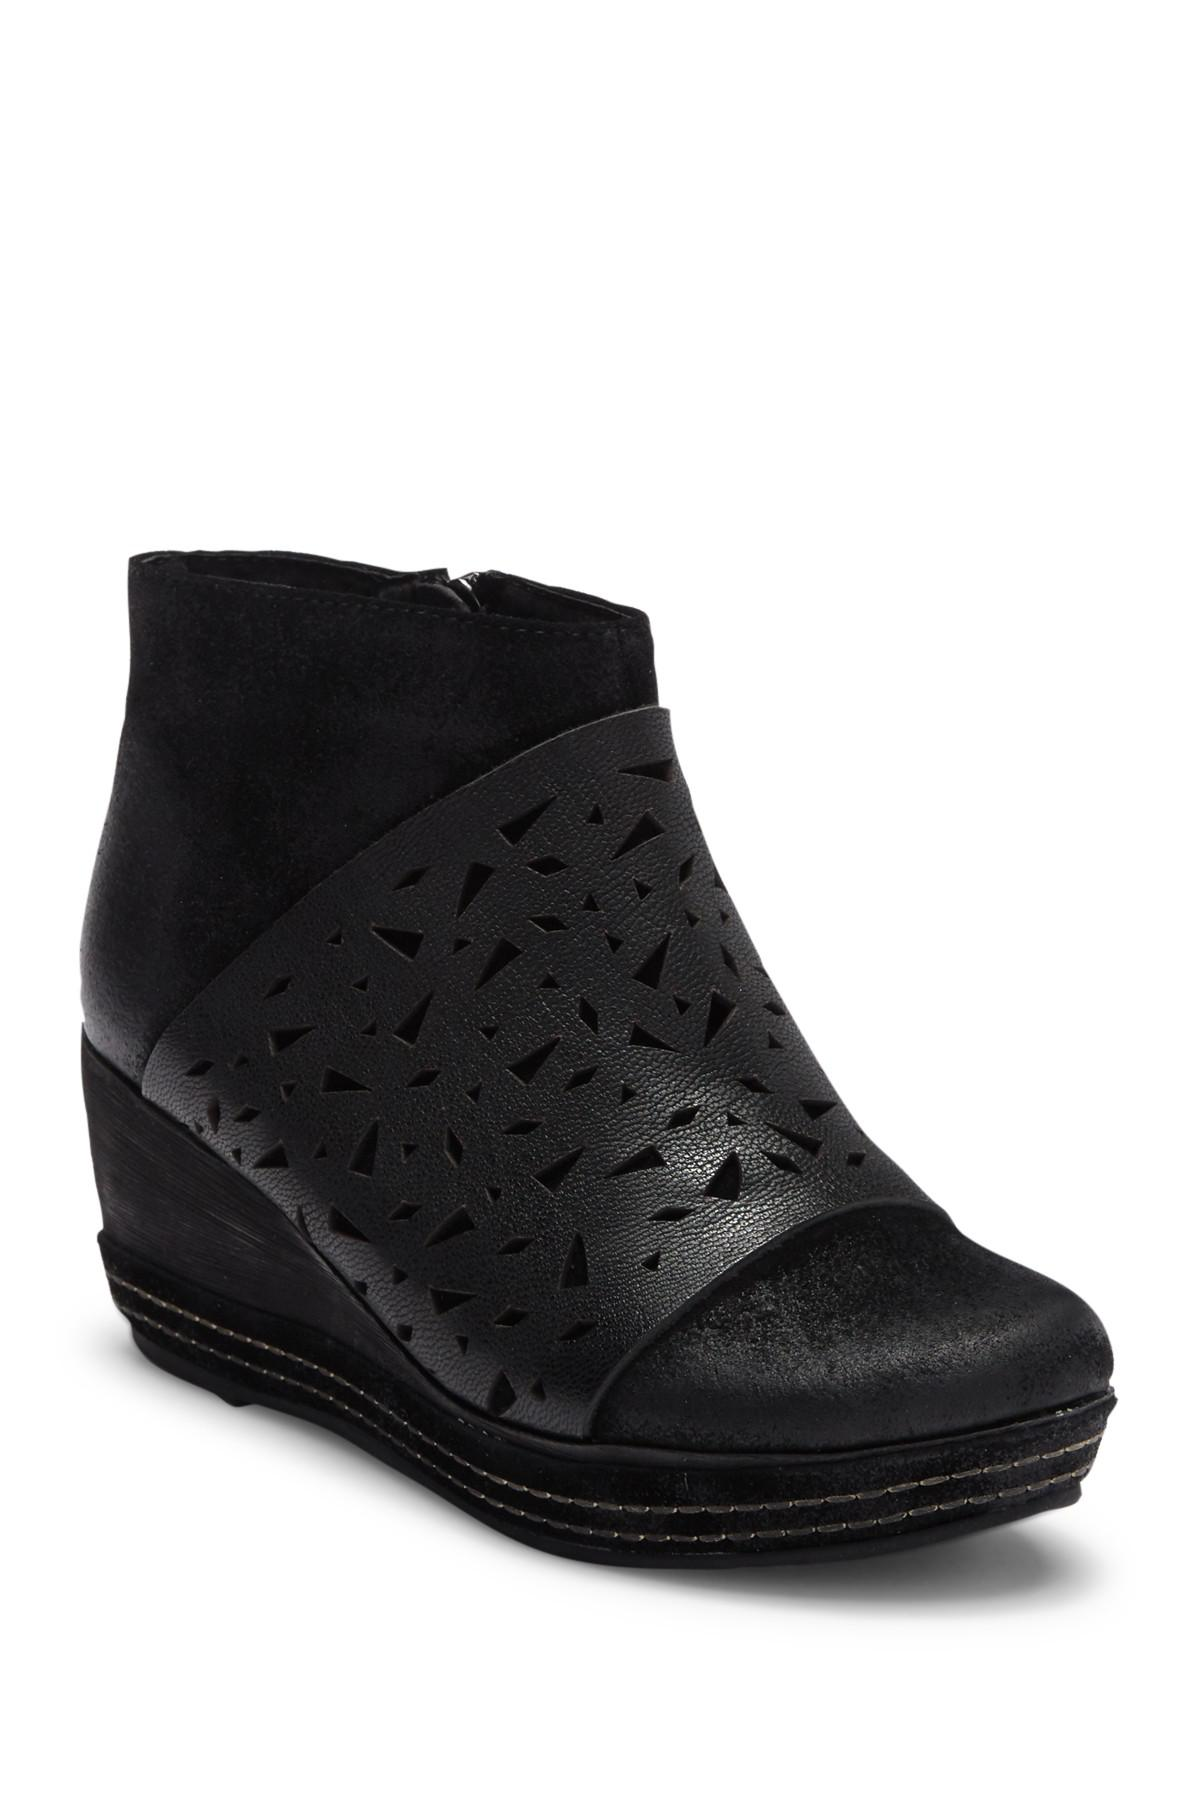 156bdb09dae6 Lyst - Antelope Lasercut Leather Wedge Bootie in Black